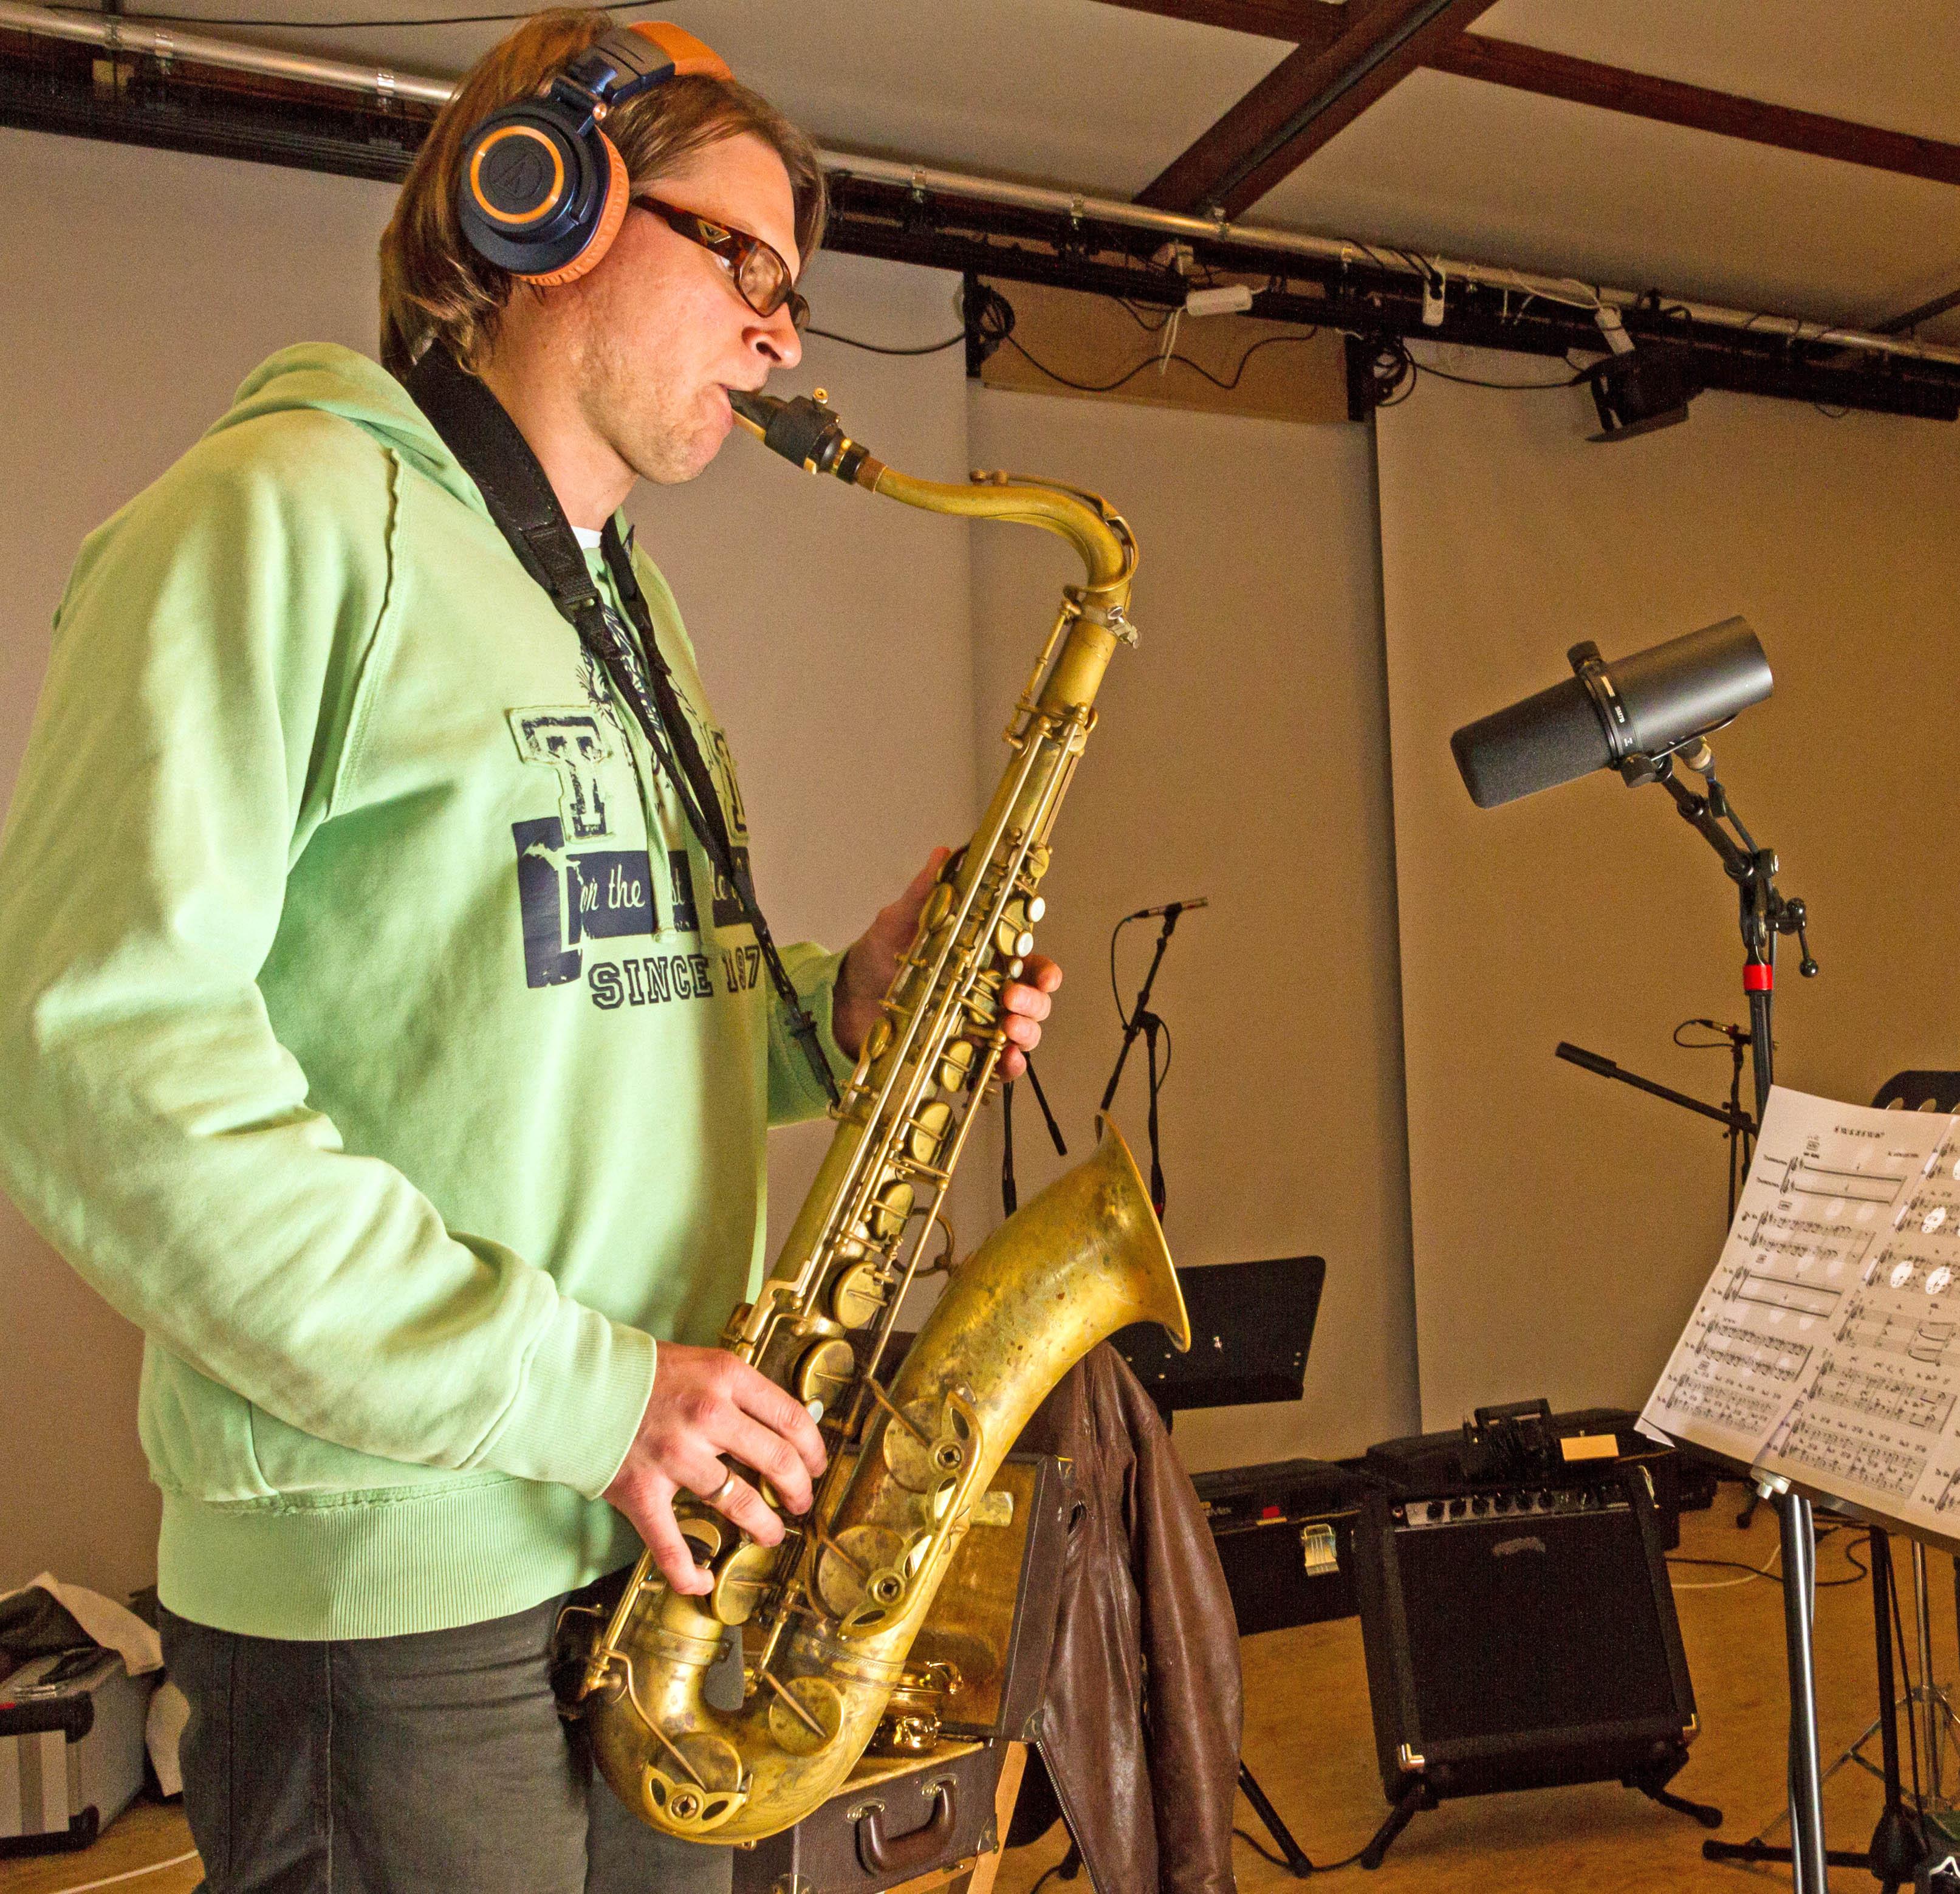 Microphone setup for tenor saxophone